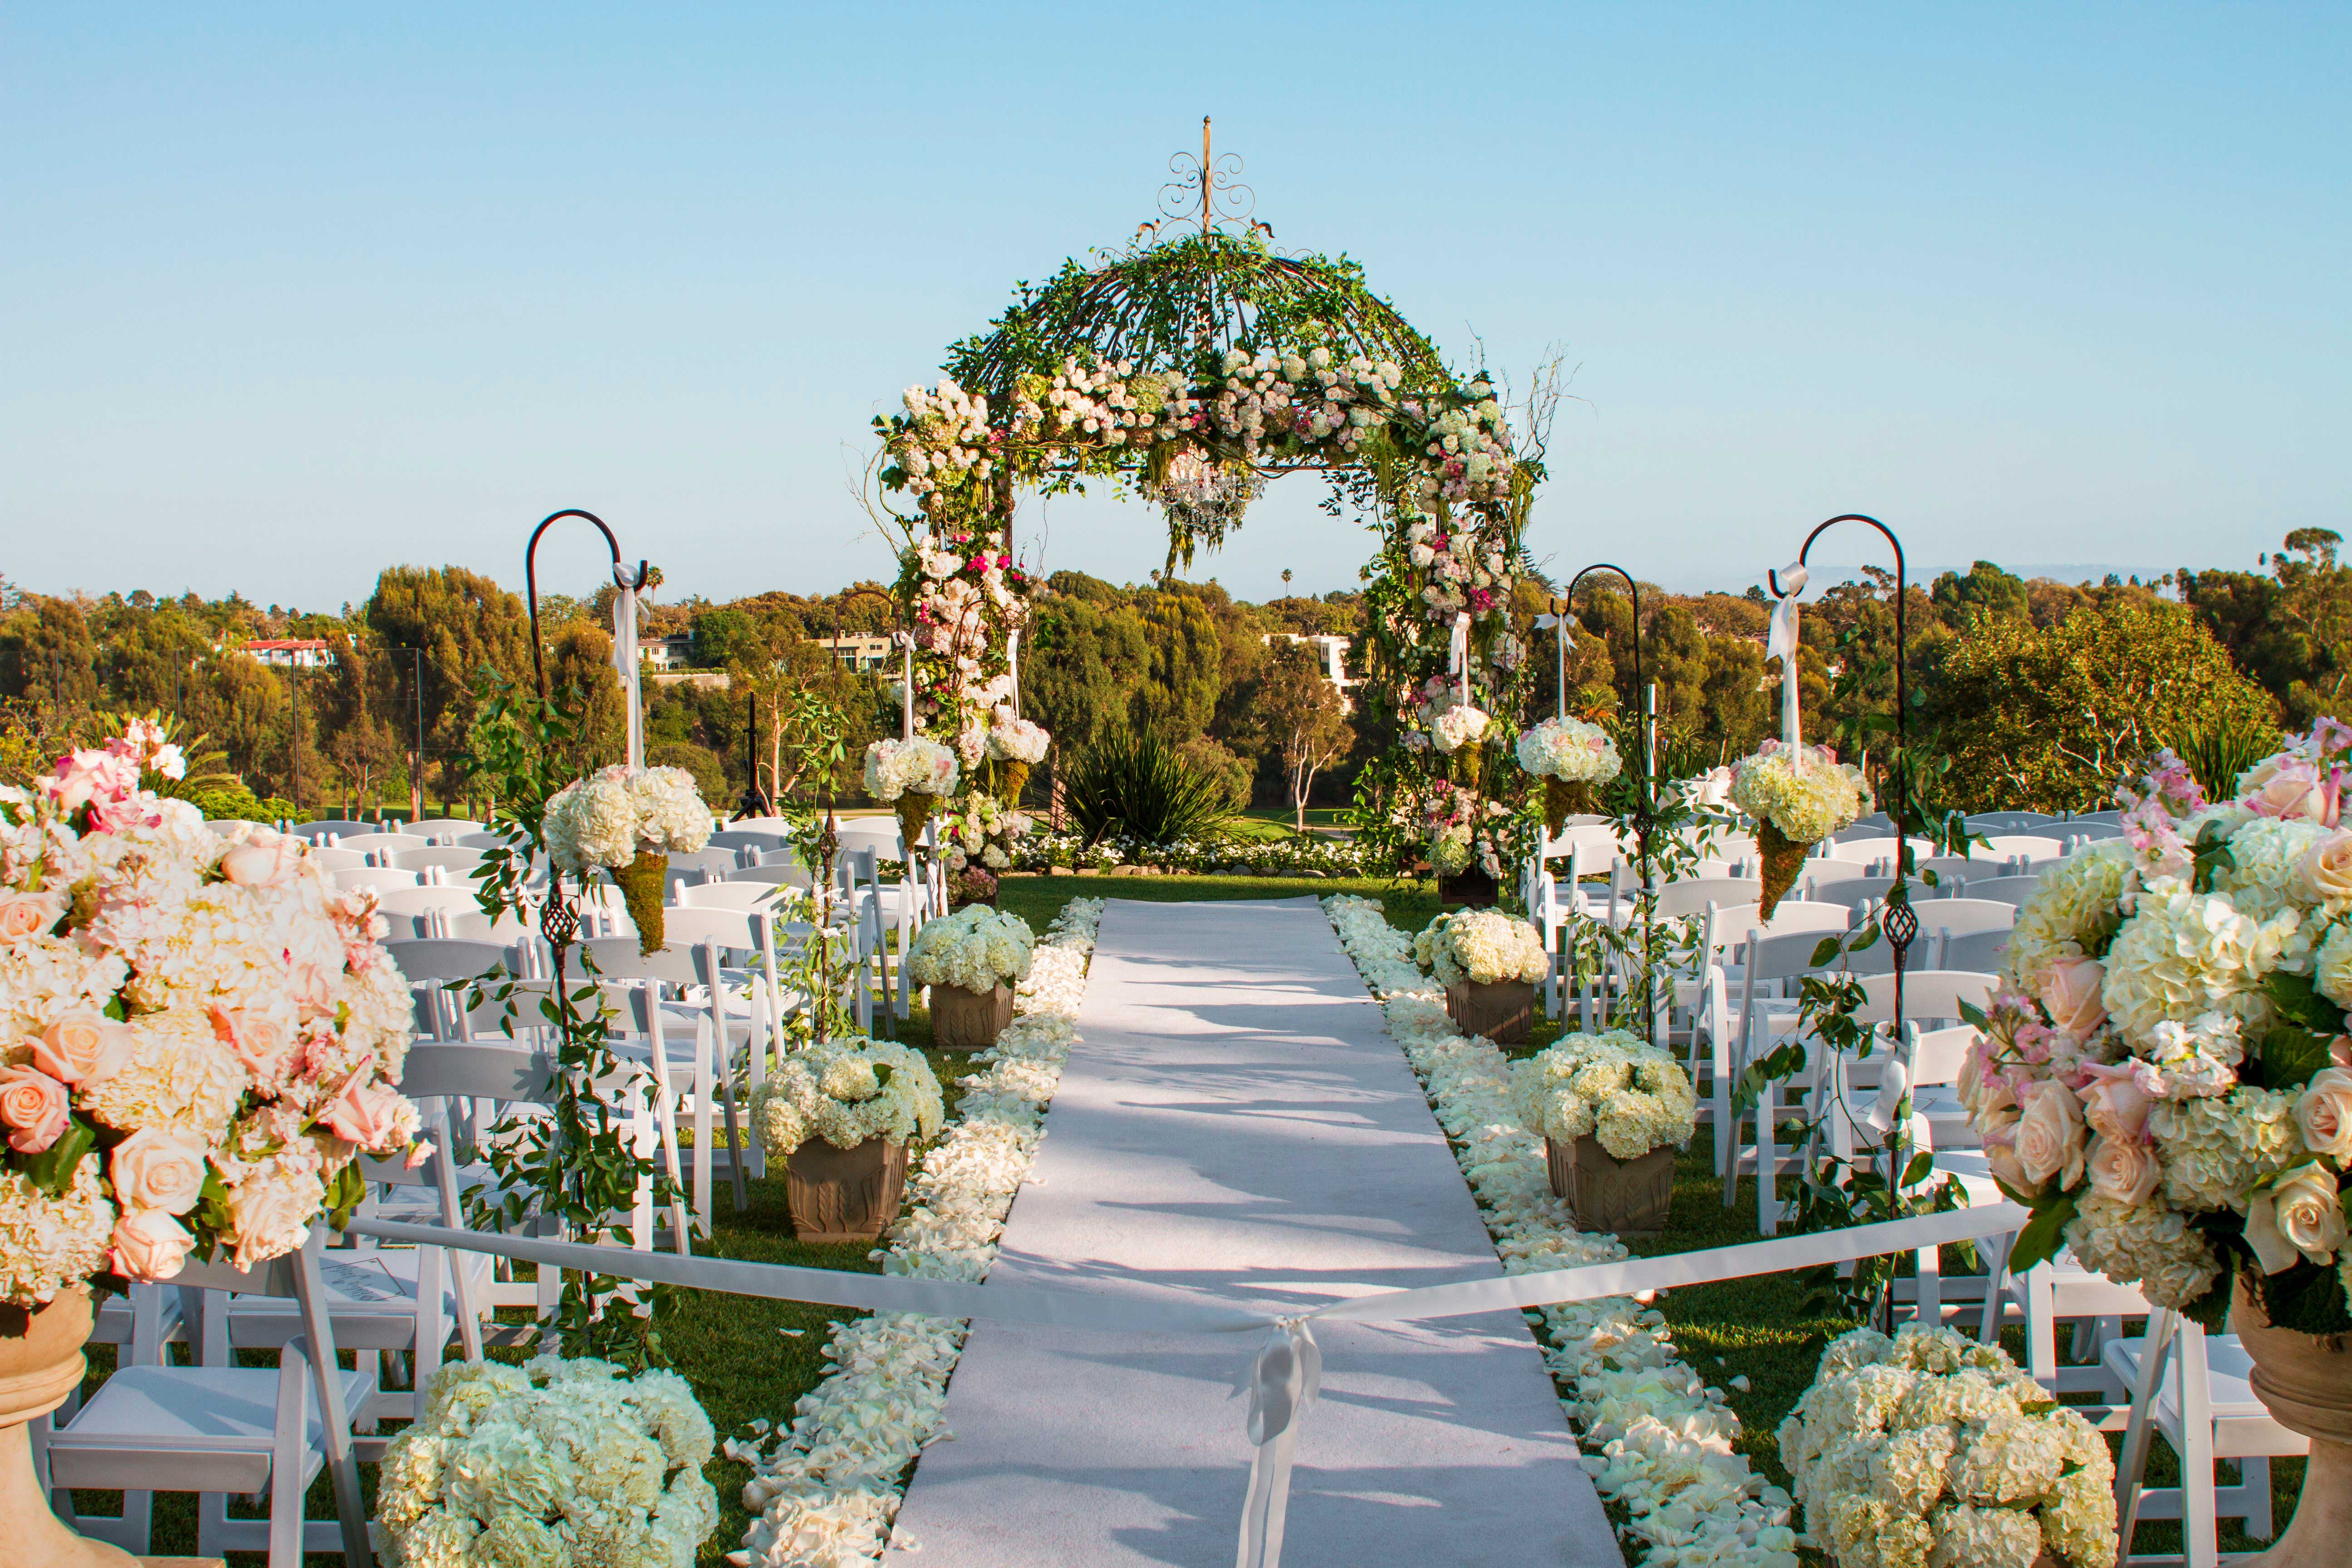 garden wedding inspiration, ceremony aisle decor